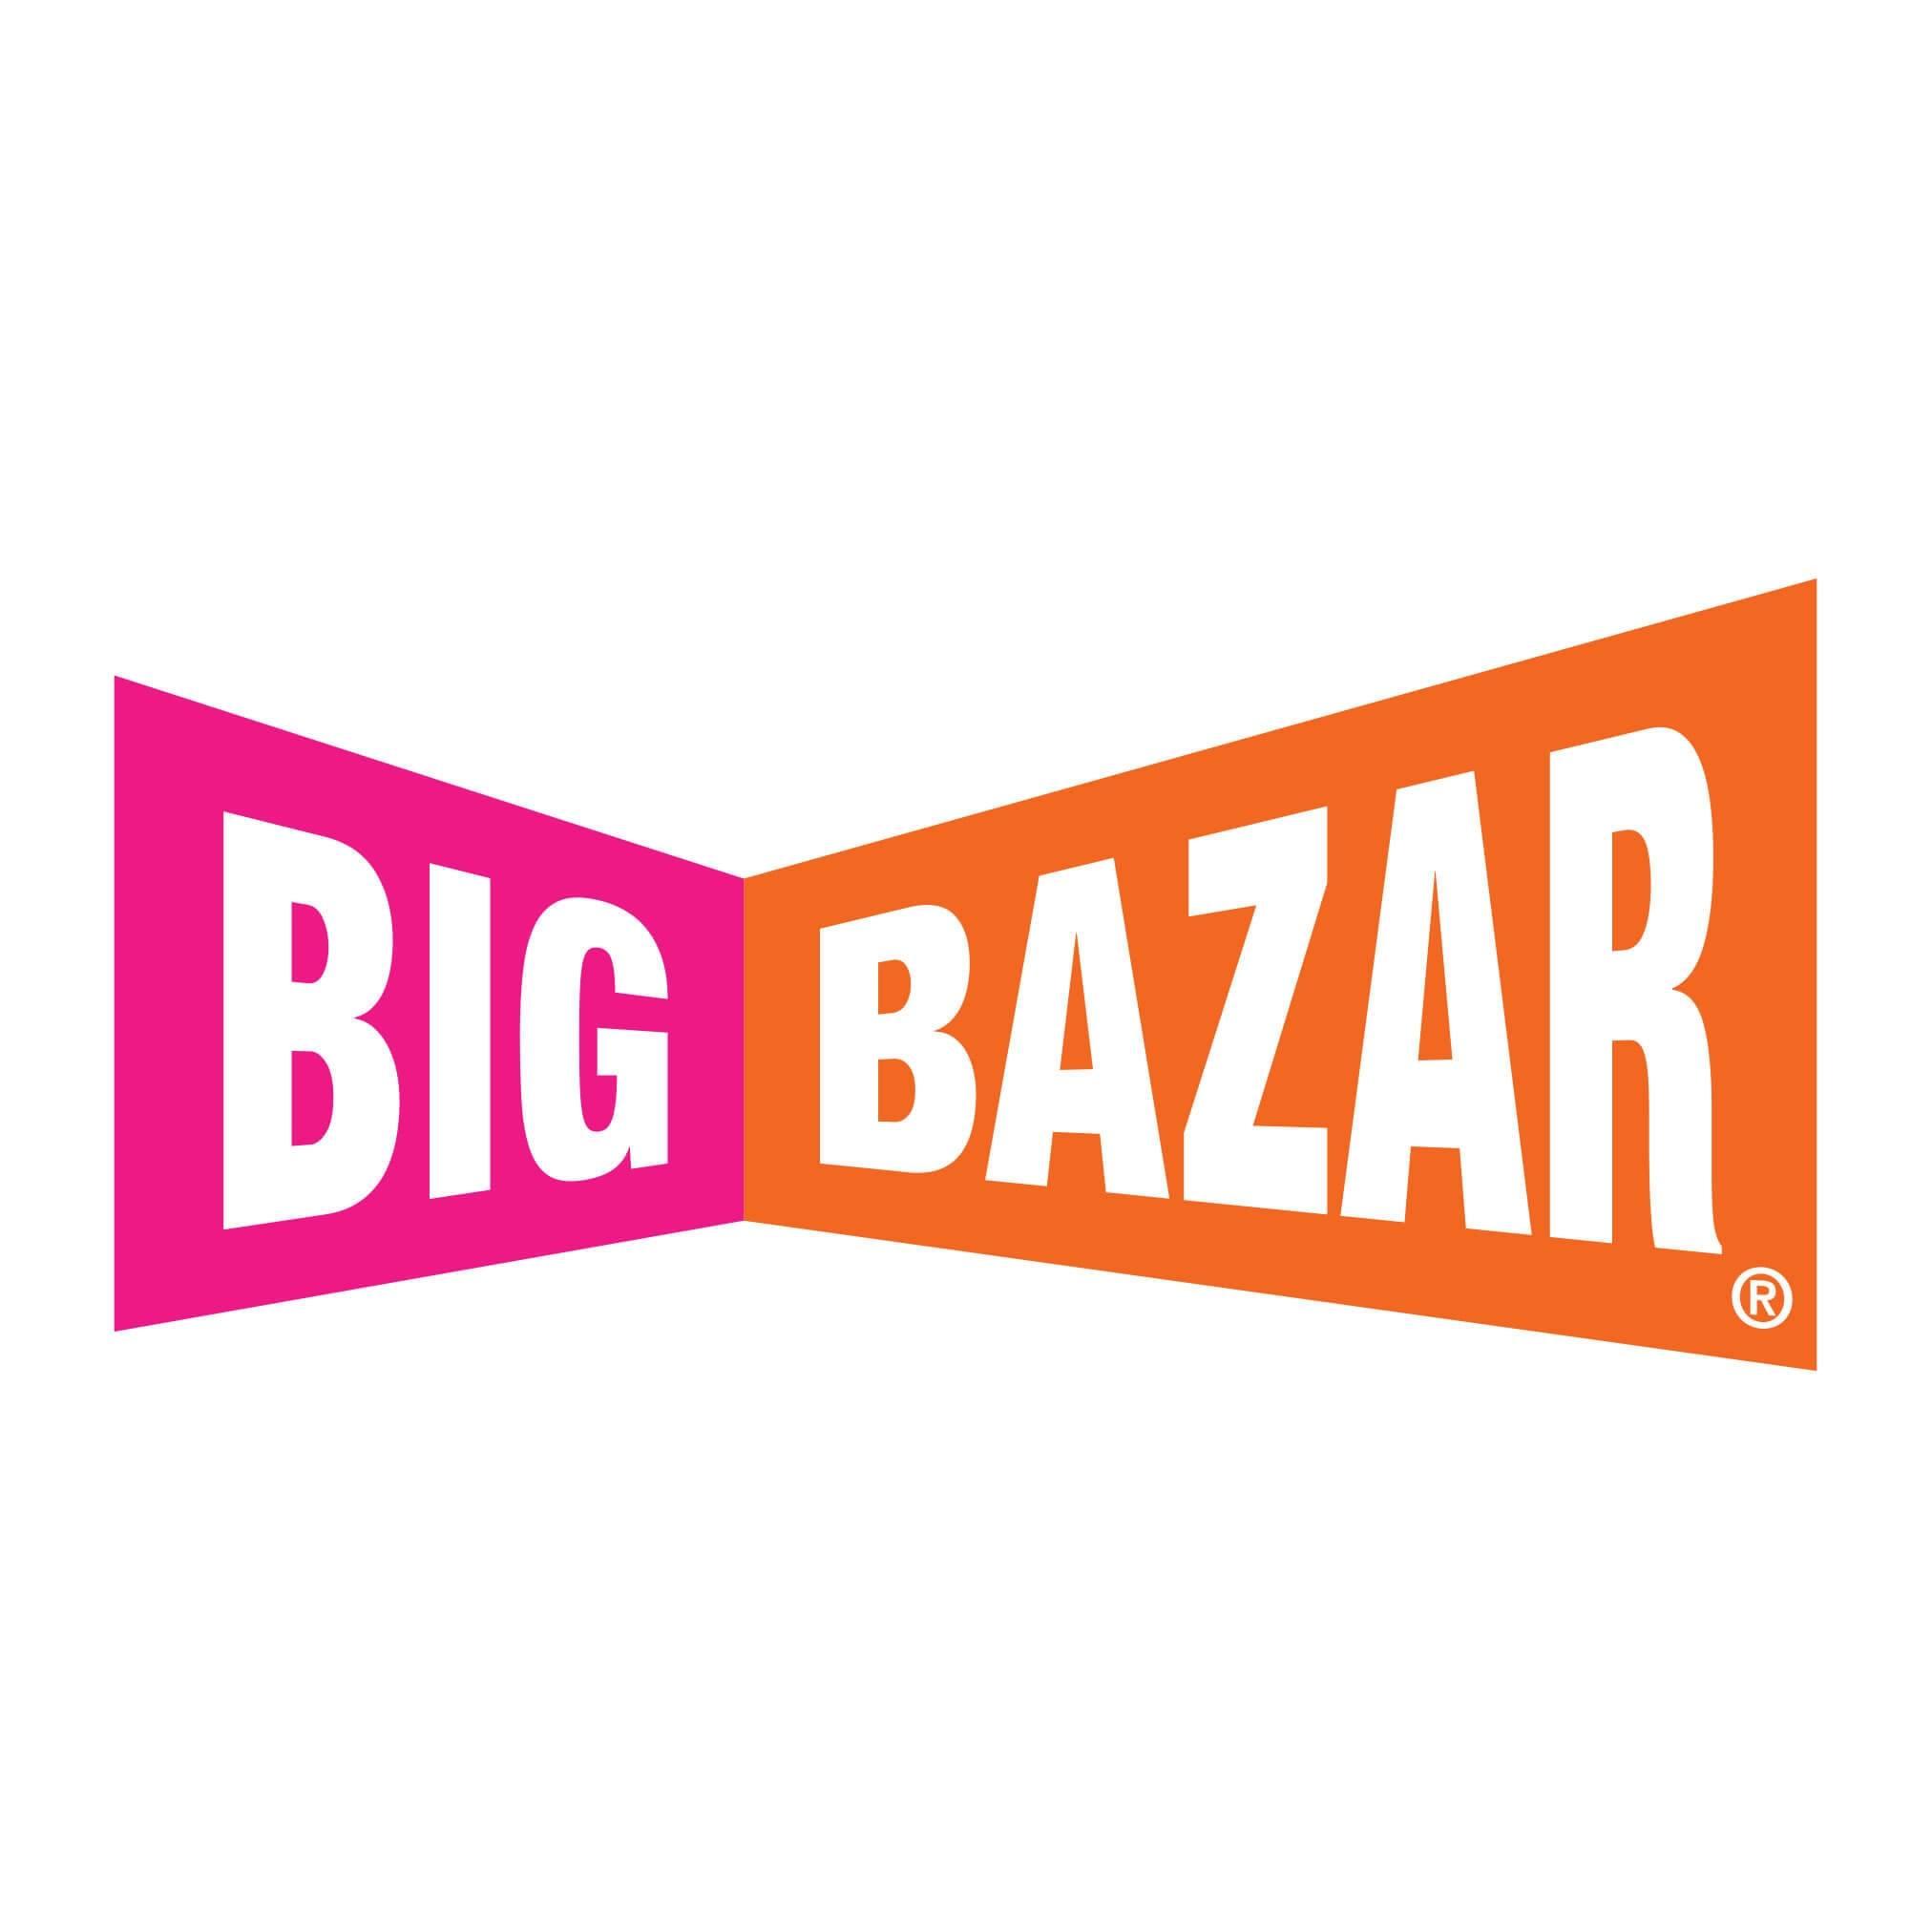 big bazar-return_policy-how-to